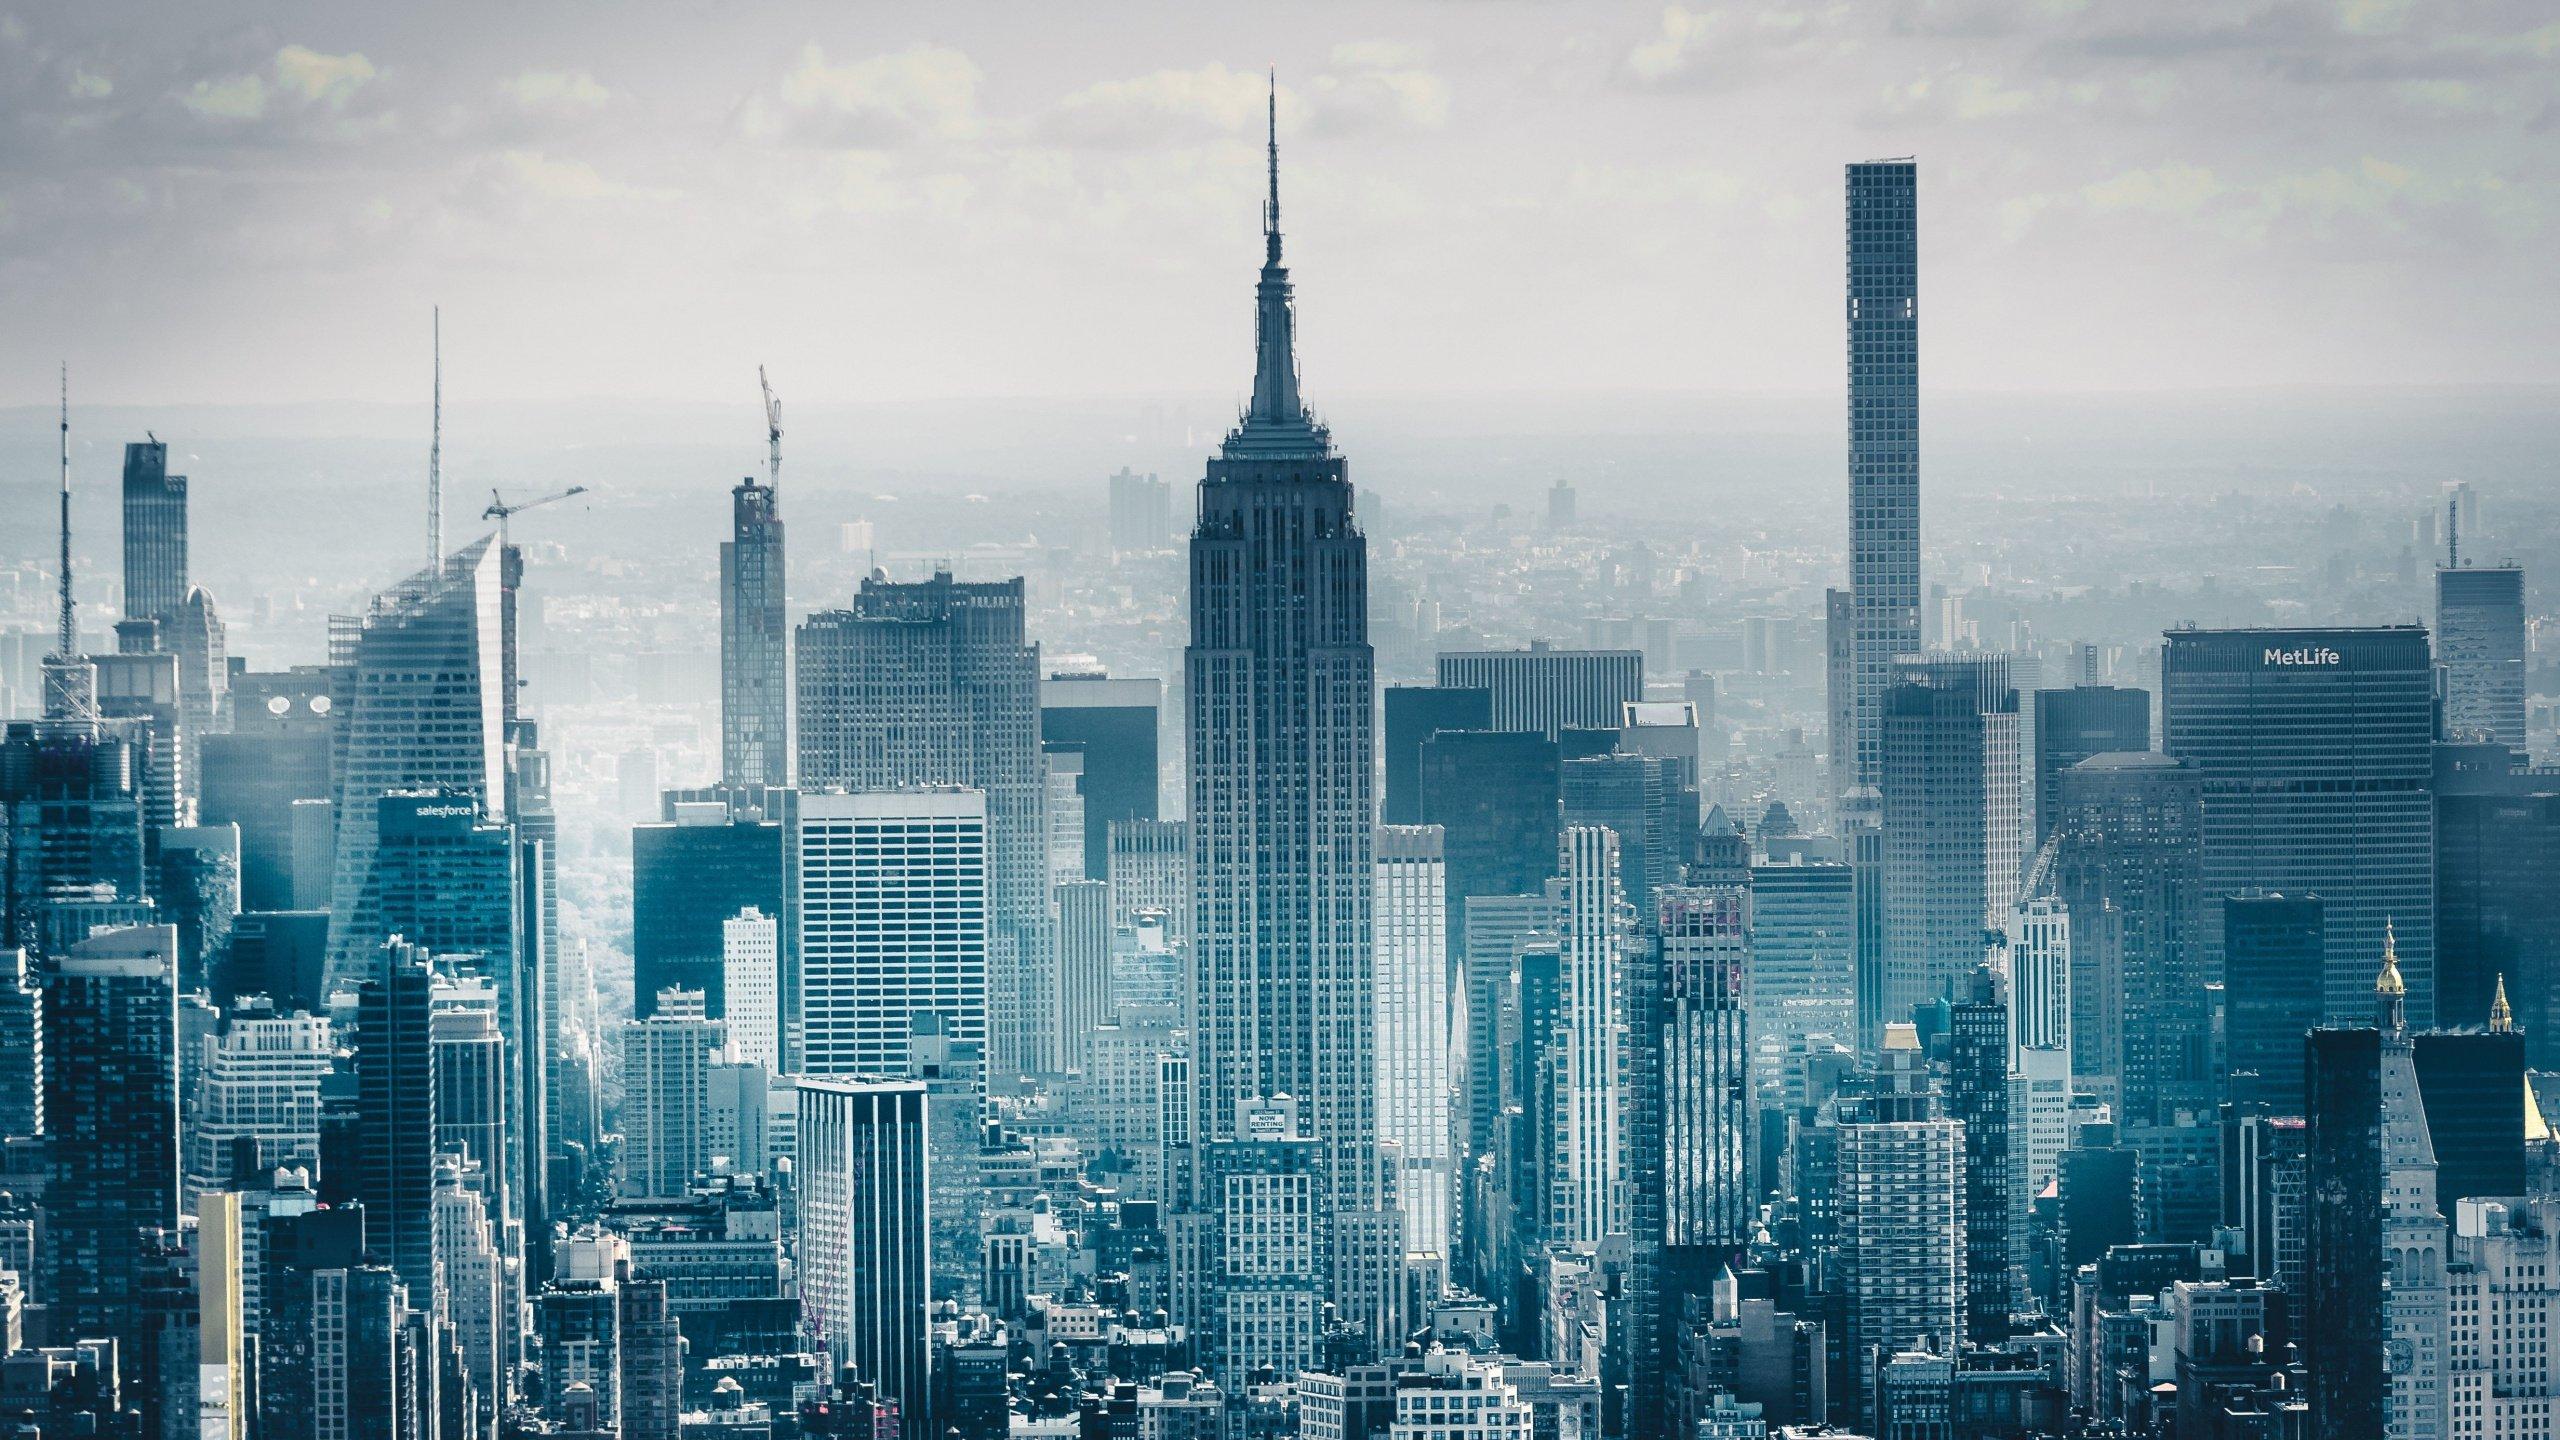 Cityscape Of New York City Hd Wallpaper